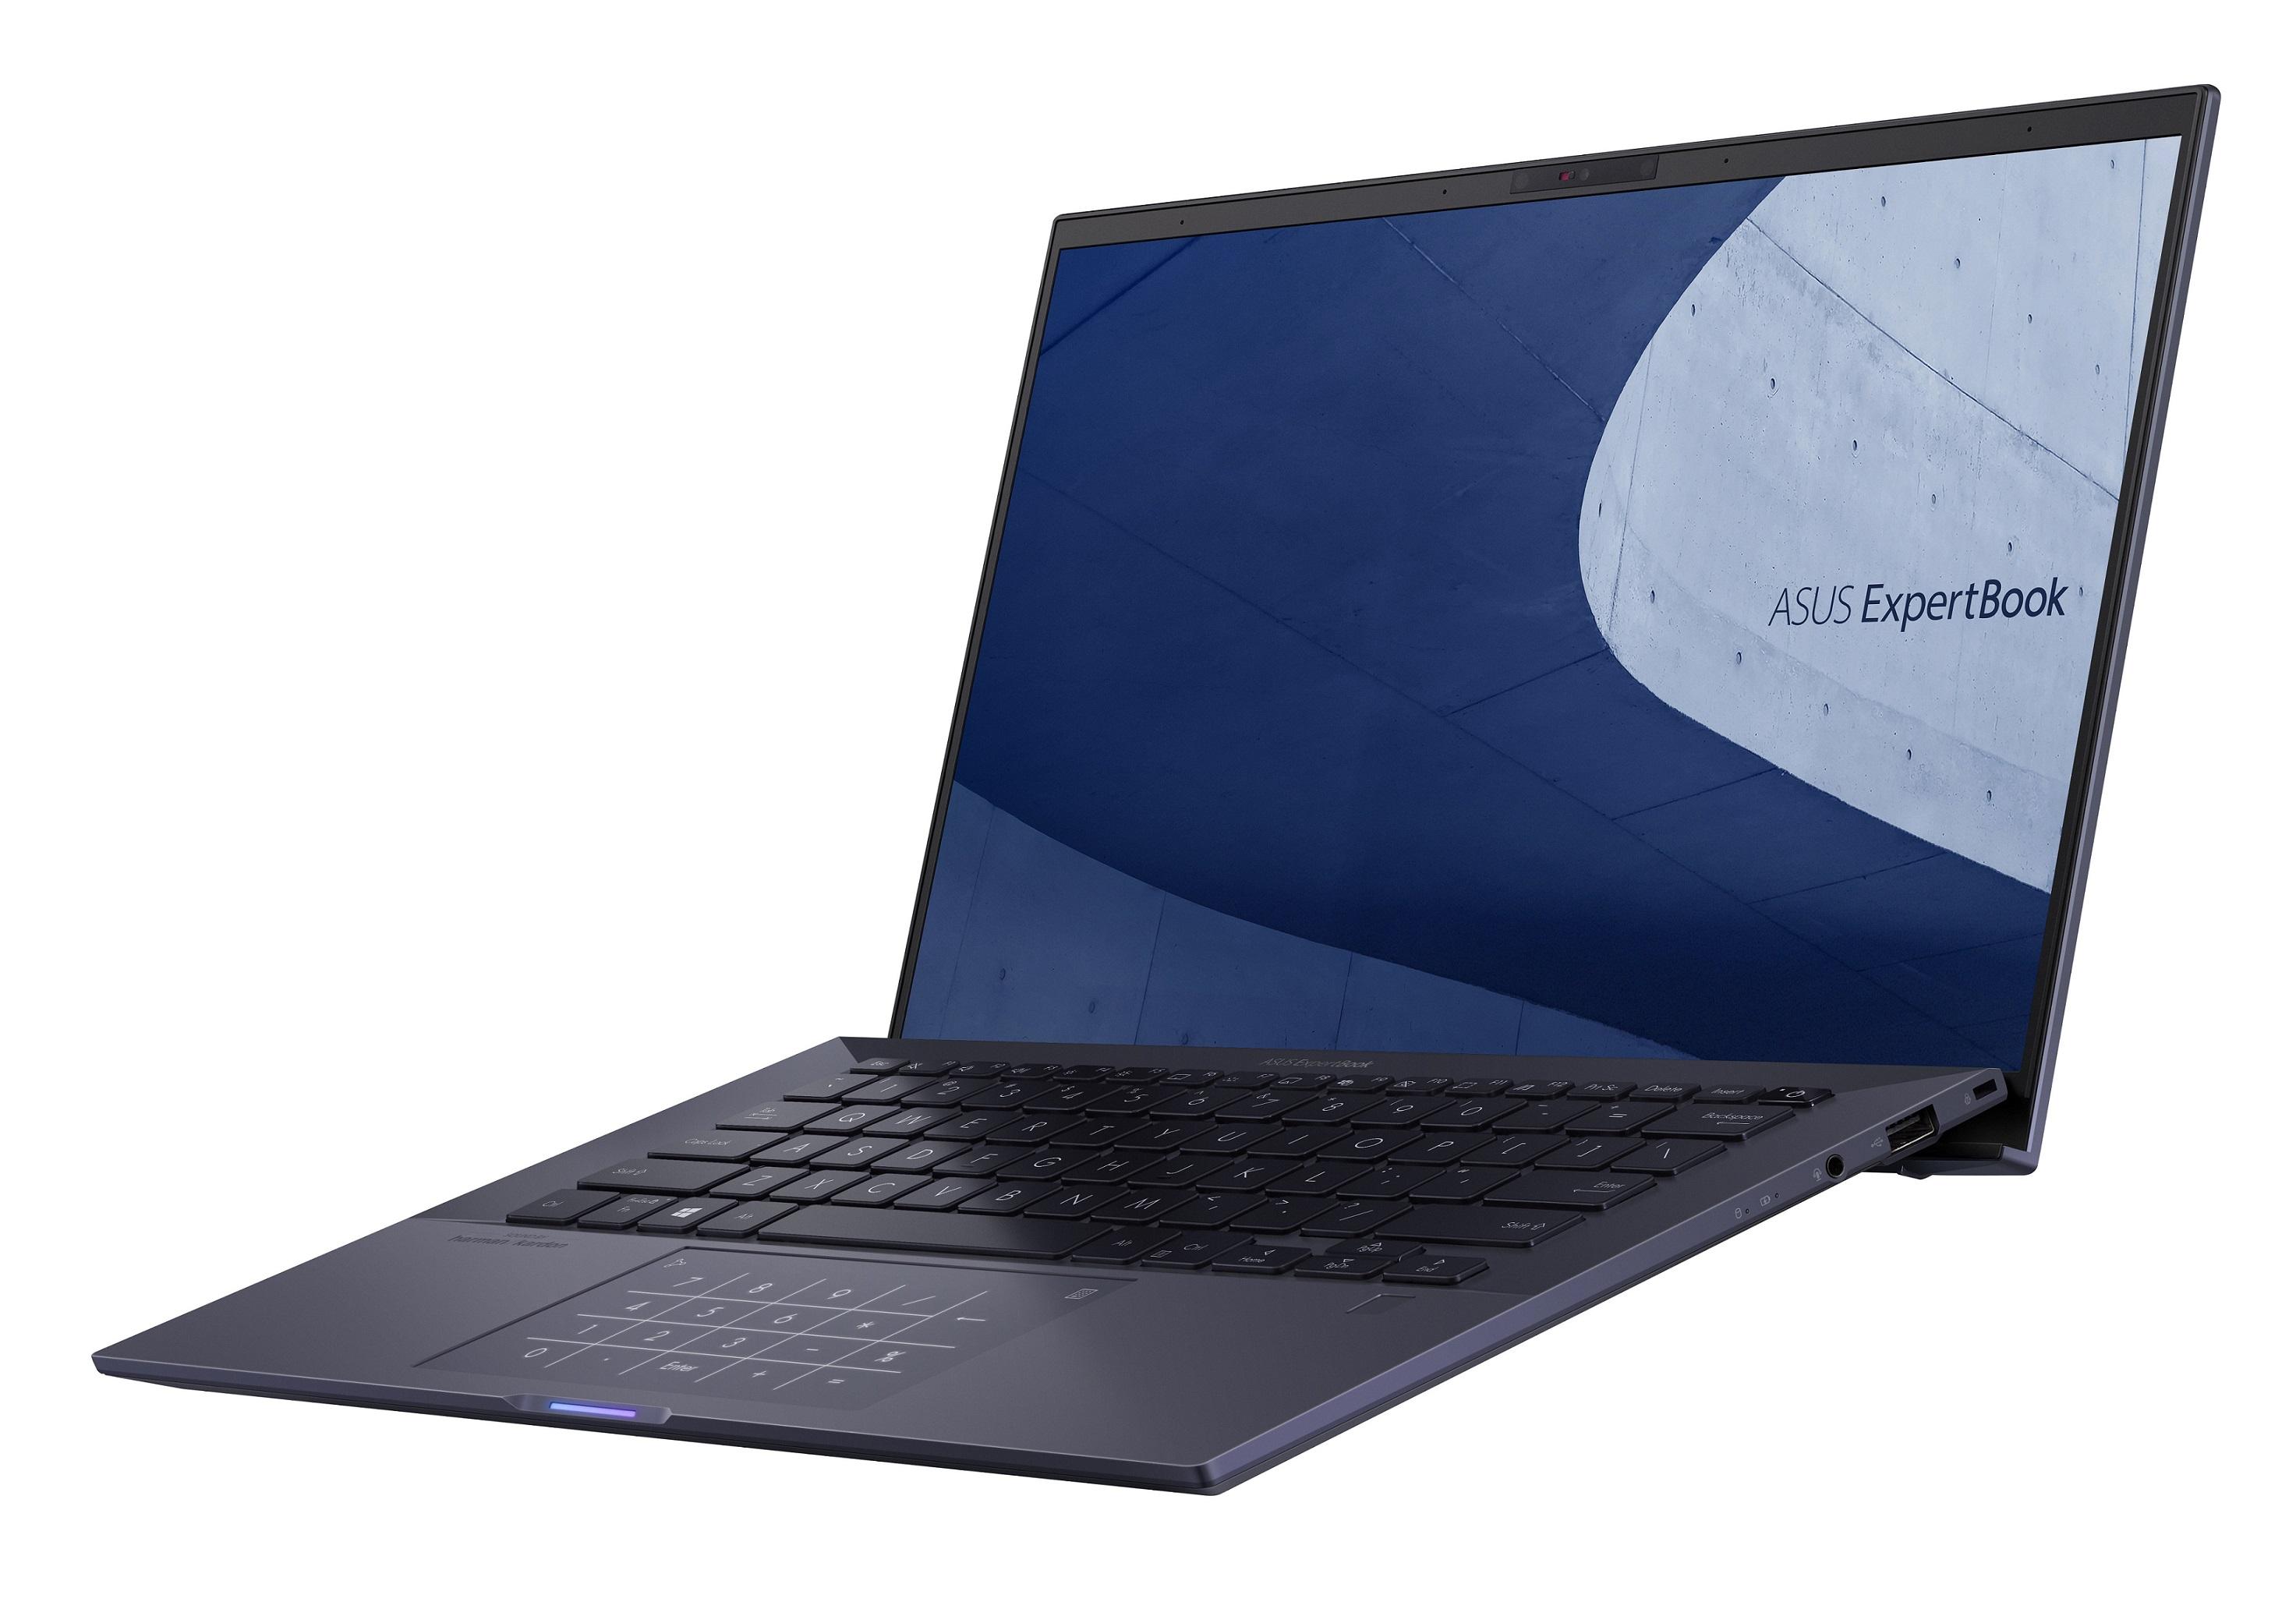 ASUS ExpertBook B9通過Intel雅典娜筆電創新計畫認證,其集結超凡效能、極致輕薄、電池續航力、高螢幕佔比等特點,讓用戶能盡享優越使用體驗。